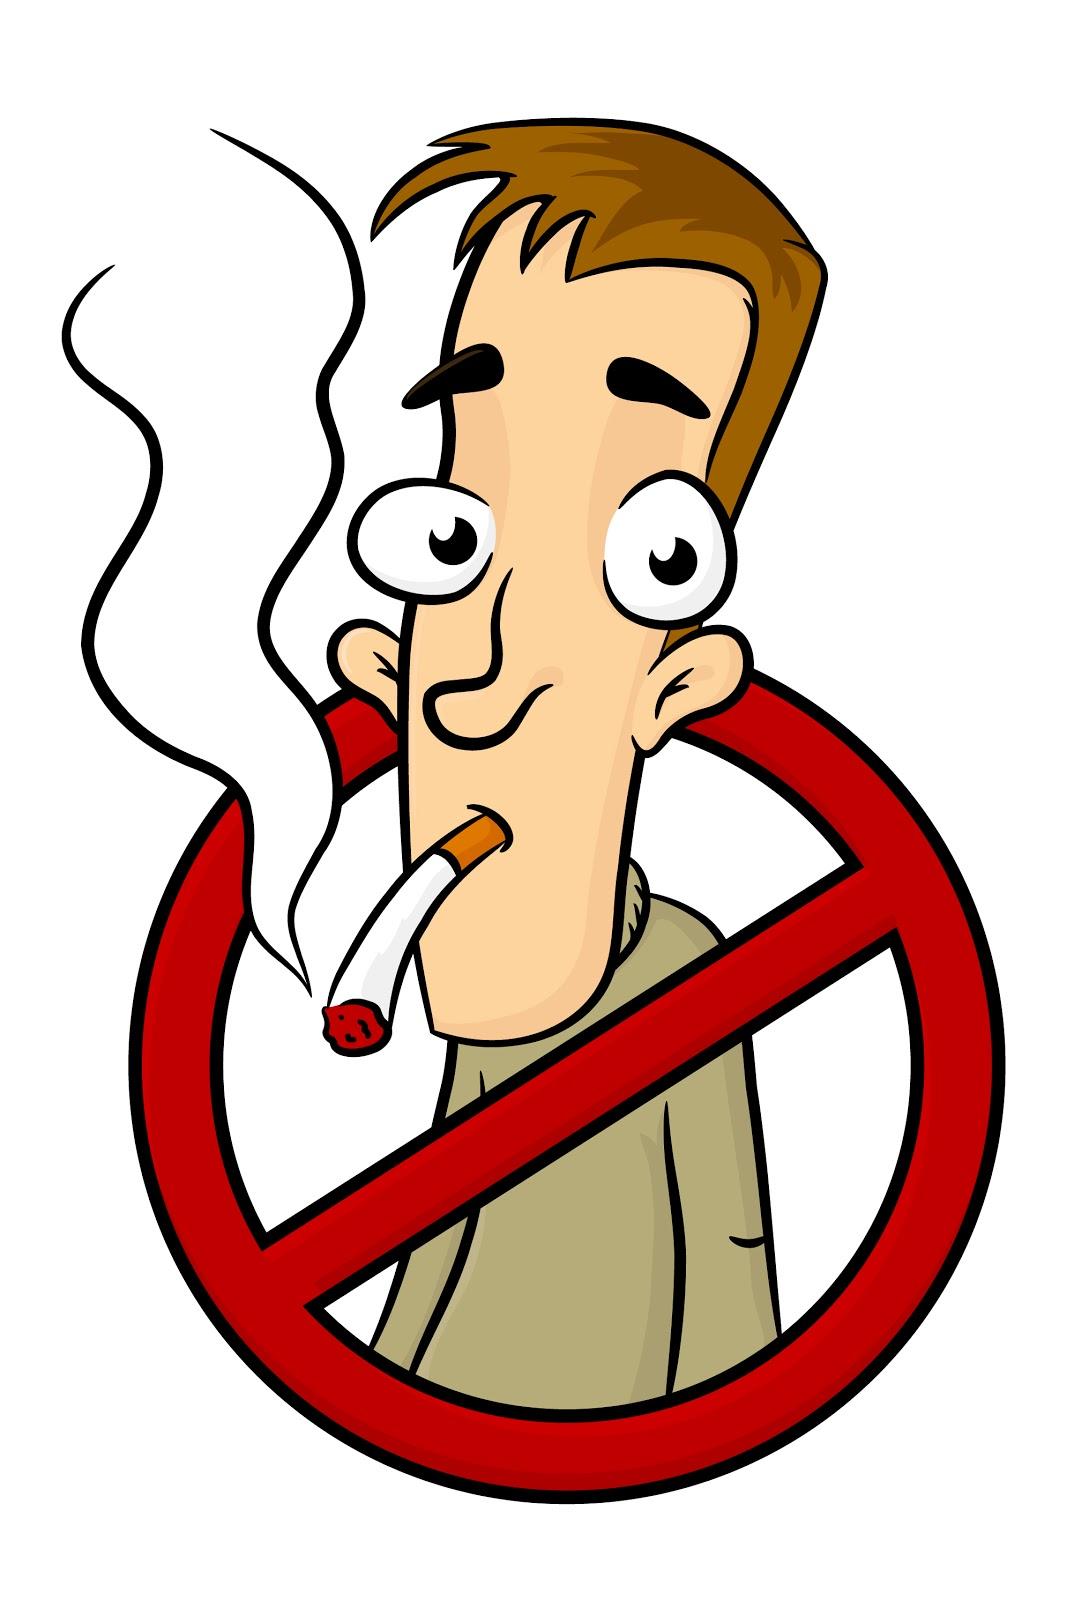 Bahaya Merokok Gambar Animasi Gambar Kartun Tentang Bahaya Merokok Keren Bestkartun